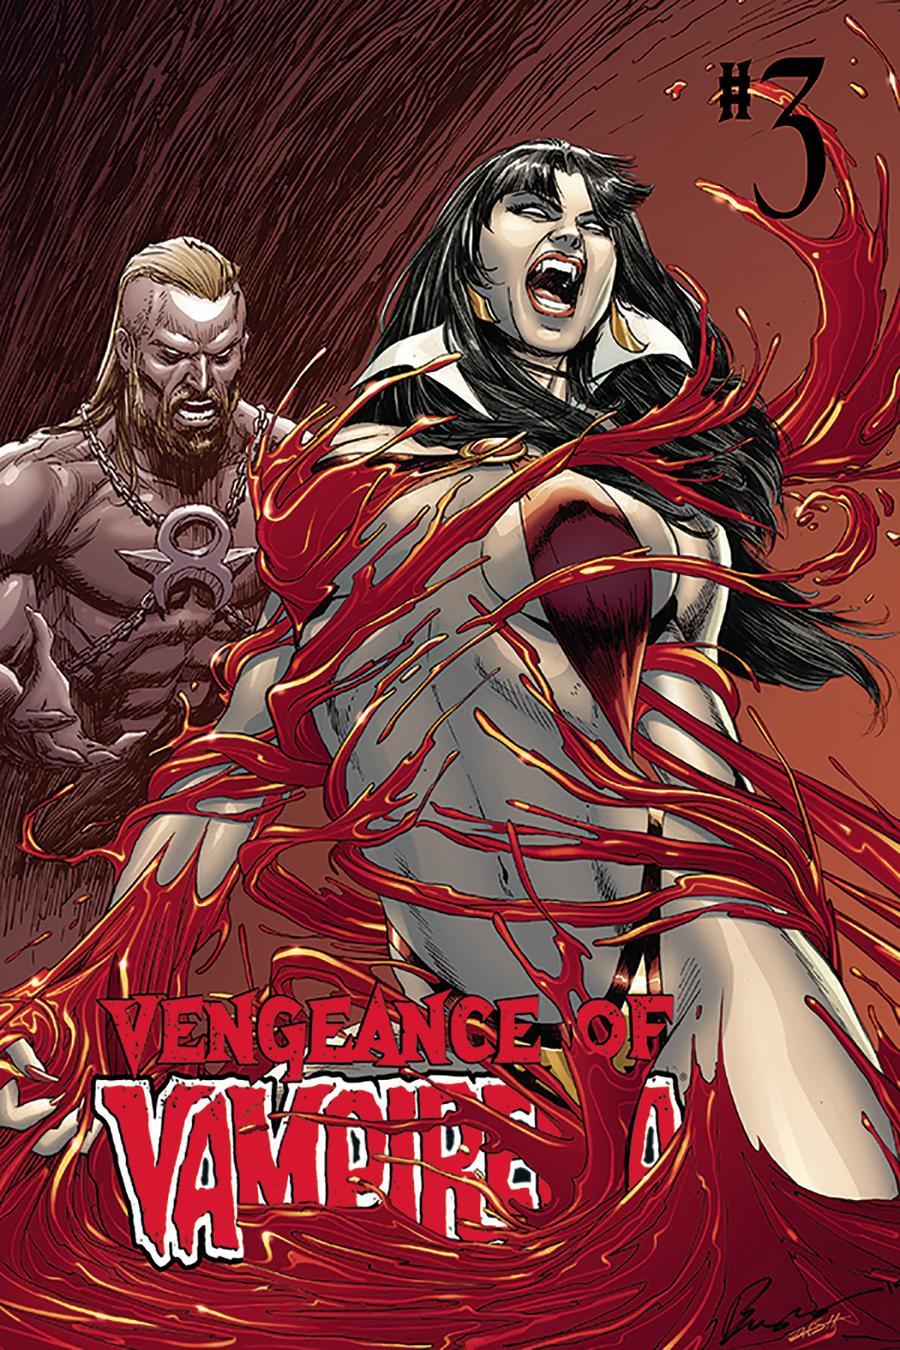 Vengeance Of Vampirella Vol 2 #3 Cover C Variant Buzz & Dash Martin Cover